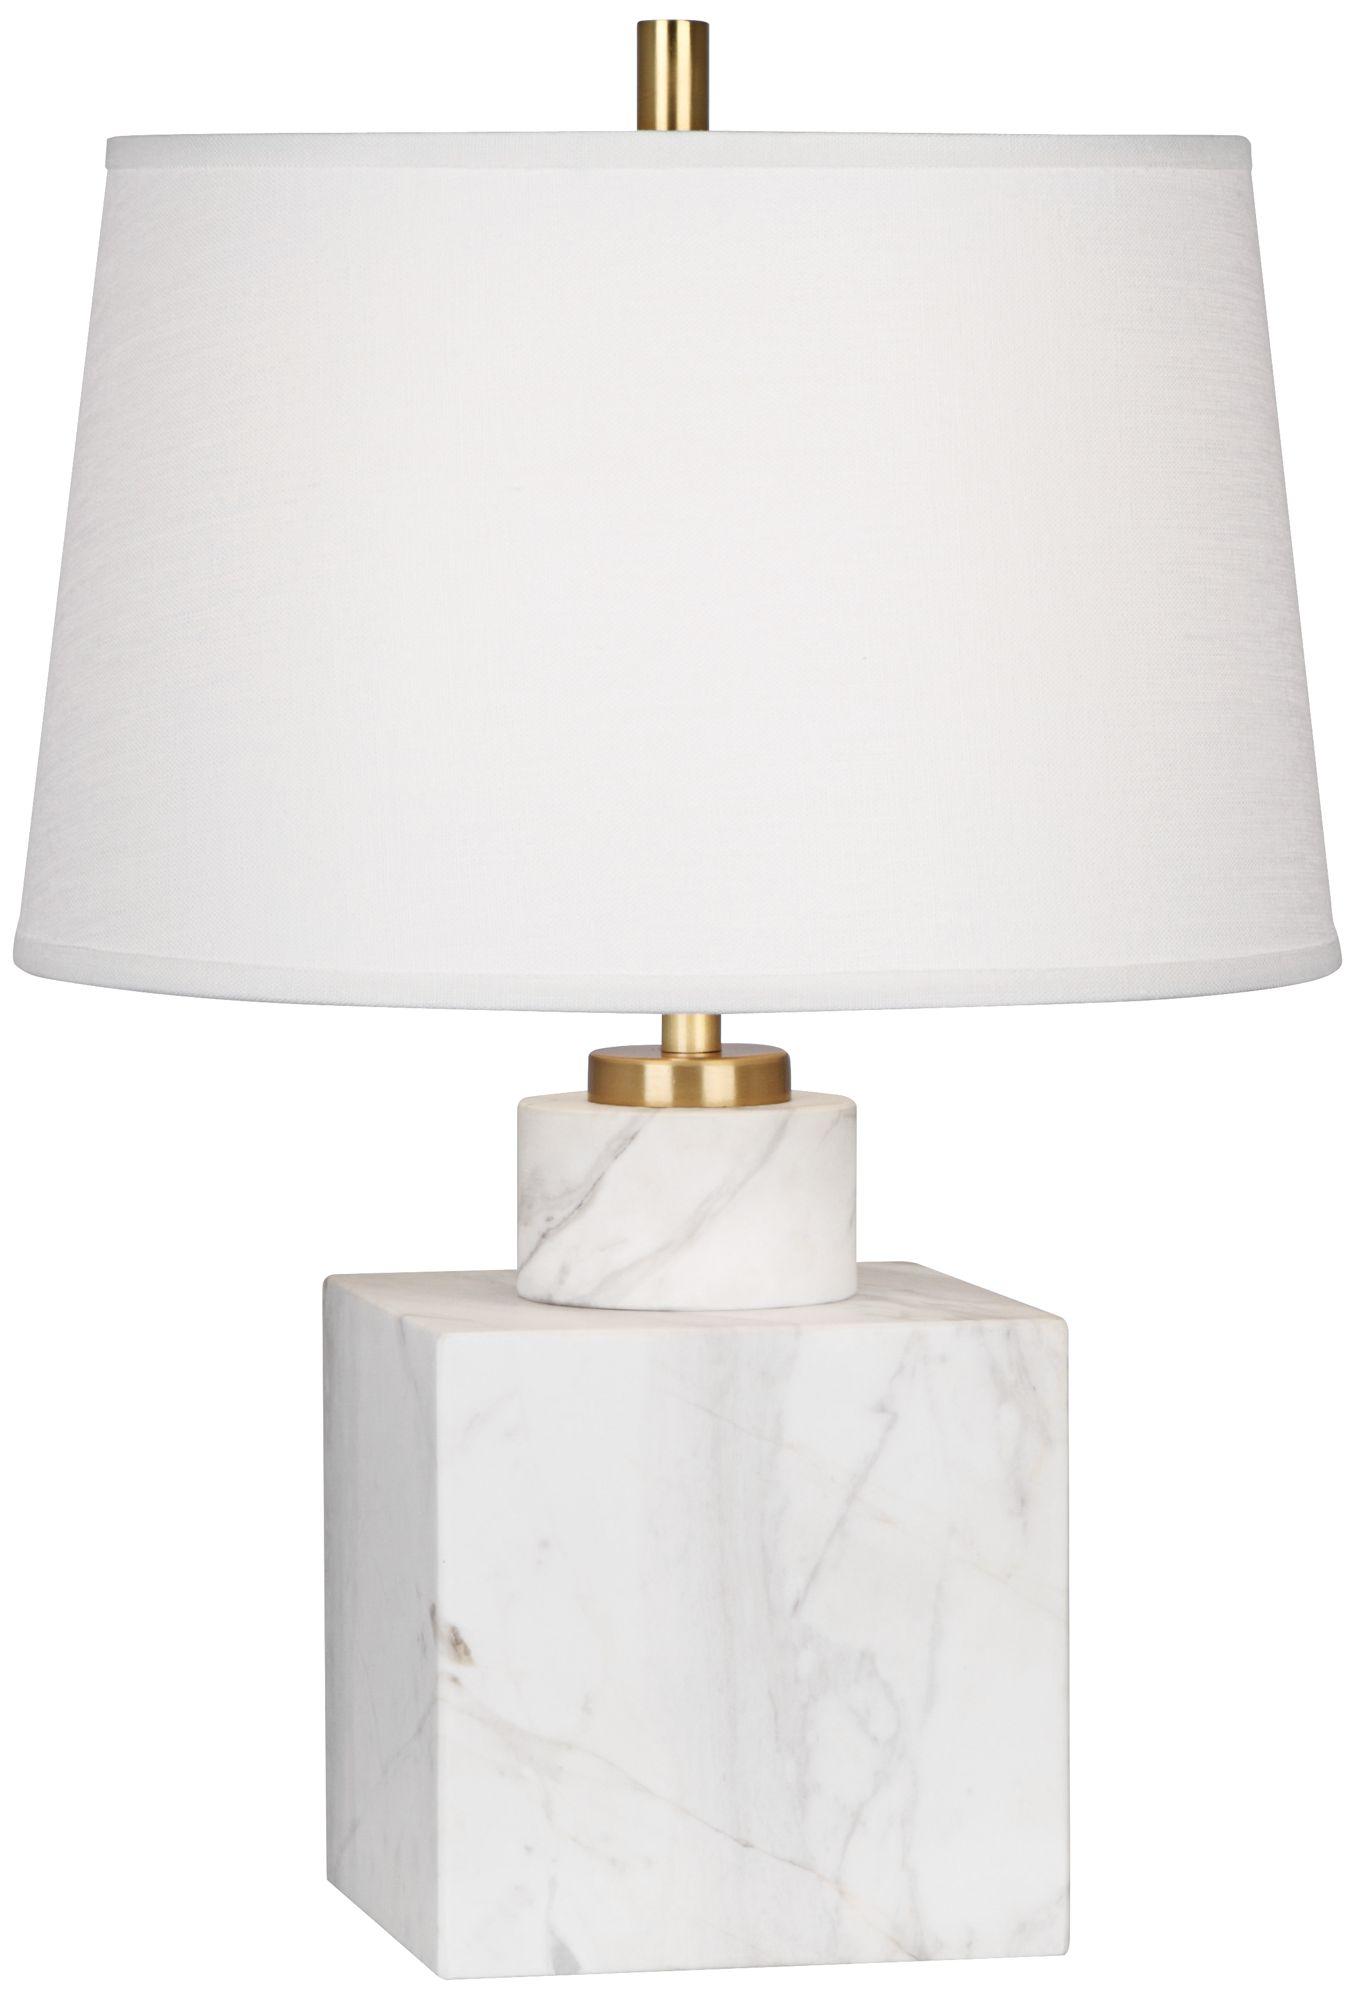 robert abbey jonathan adler canaan mini modern table lamp